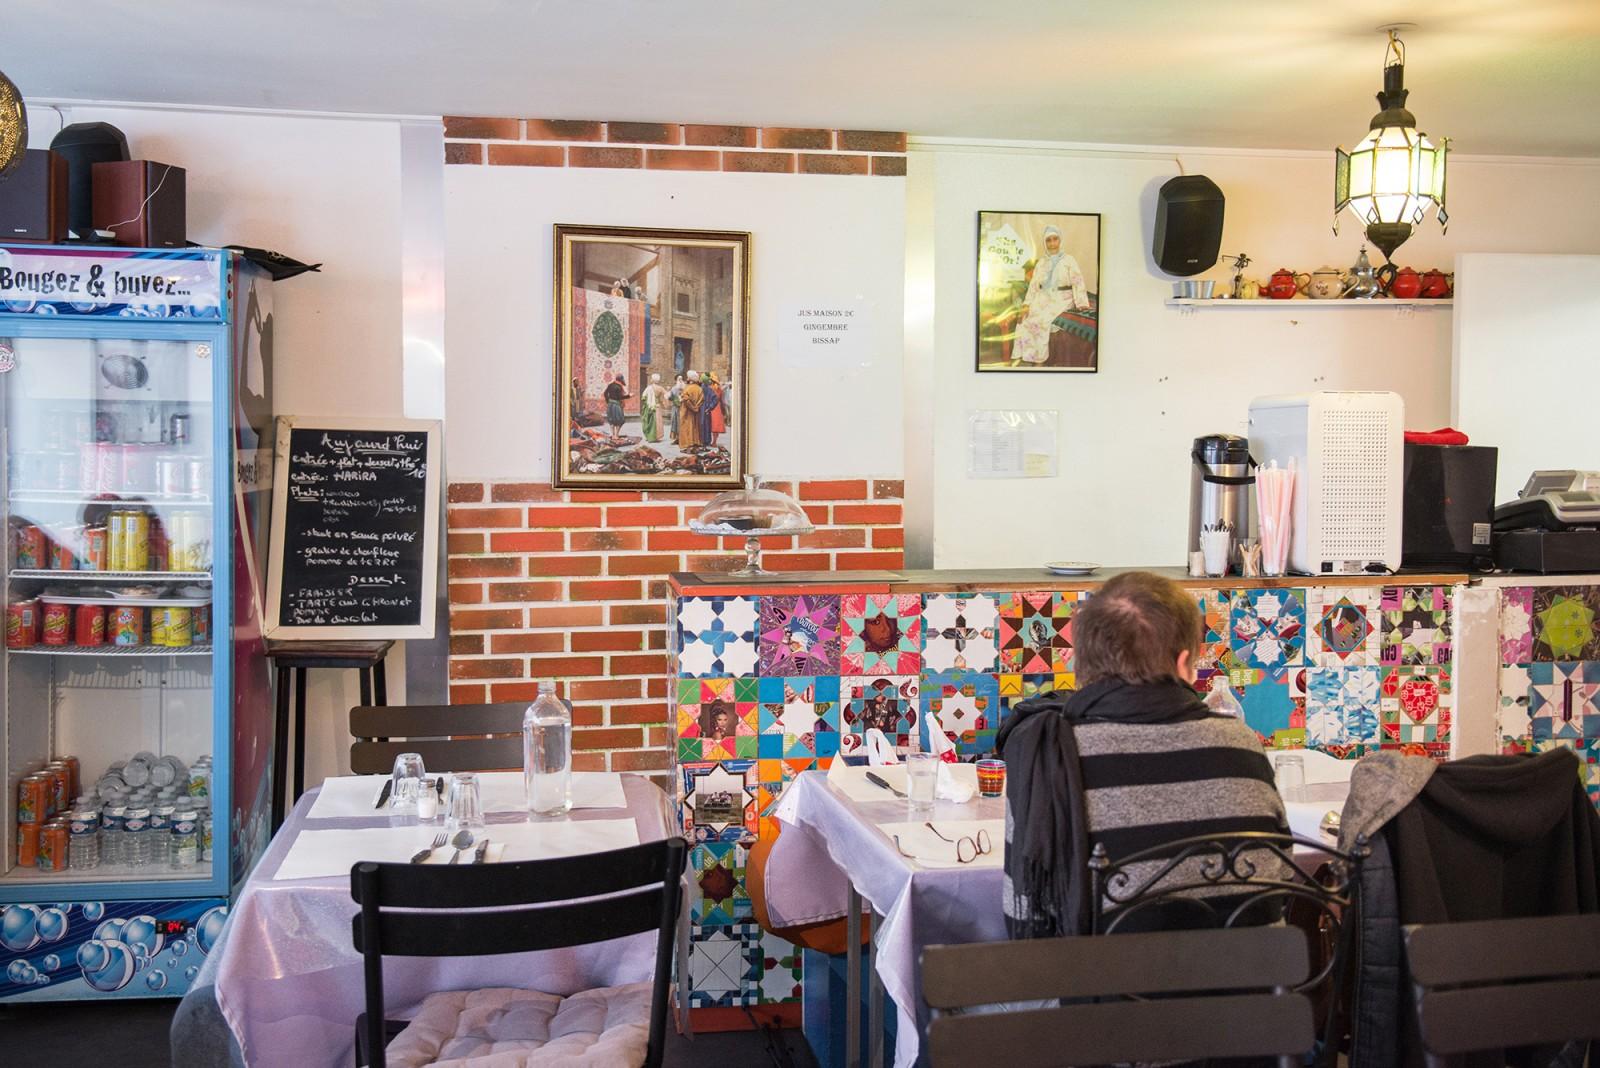 10-11-16 - Rue Myrha - Palmyre Roigt - La Table Ouverte-6